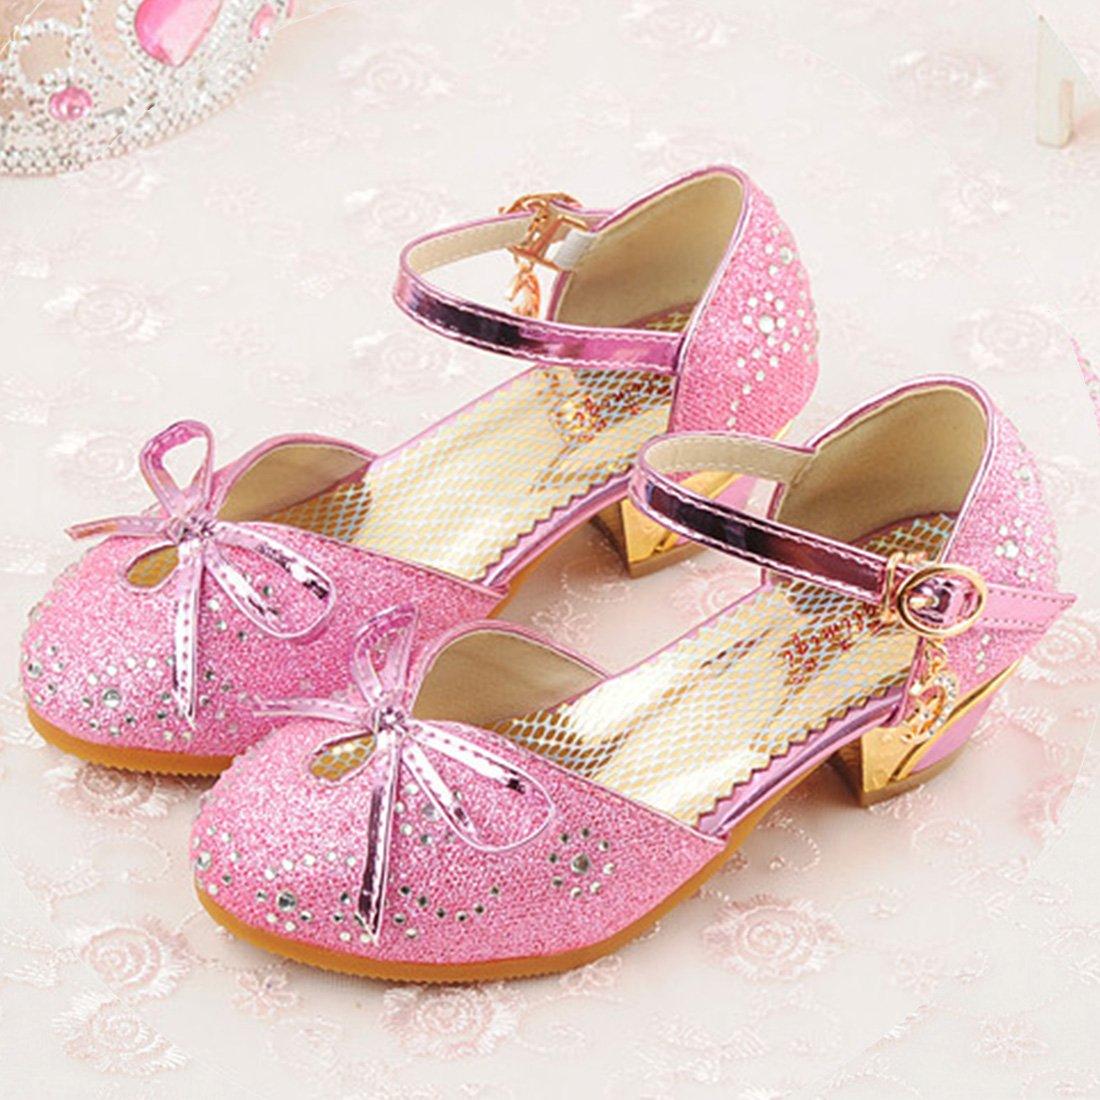 YIBLBOX Girls Kids Toddler Dress up Wedding Cosplay Princess Shoes Glitter Mary Jane Low Heel Shoes by YIBLBOX (Image #2)